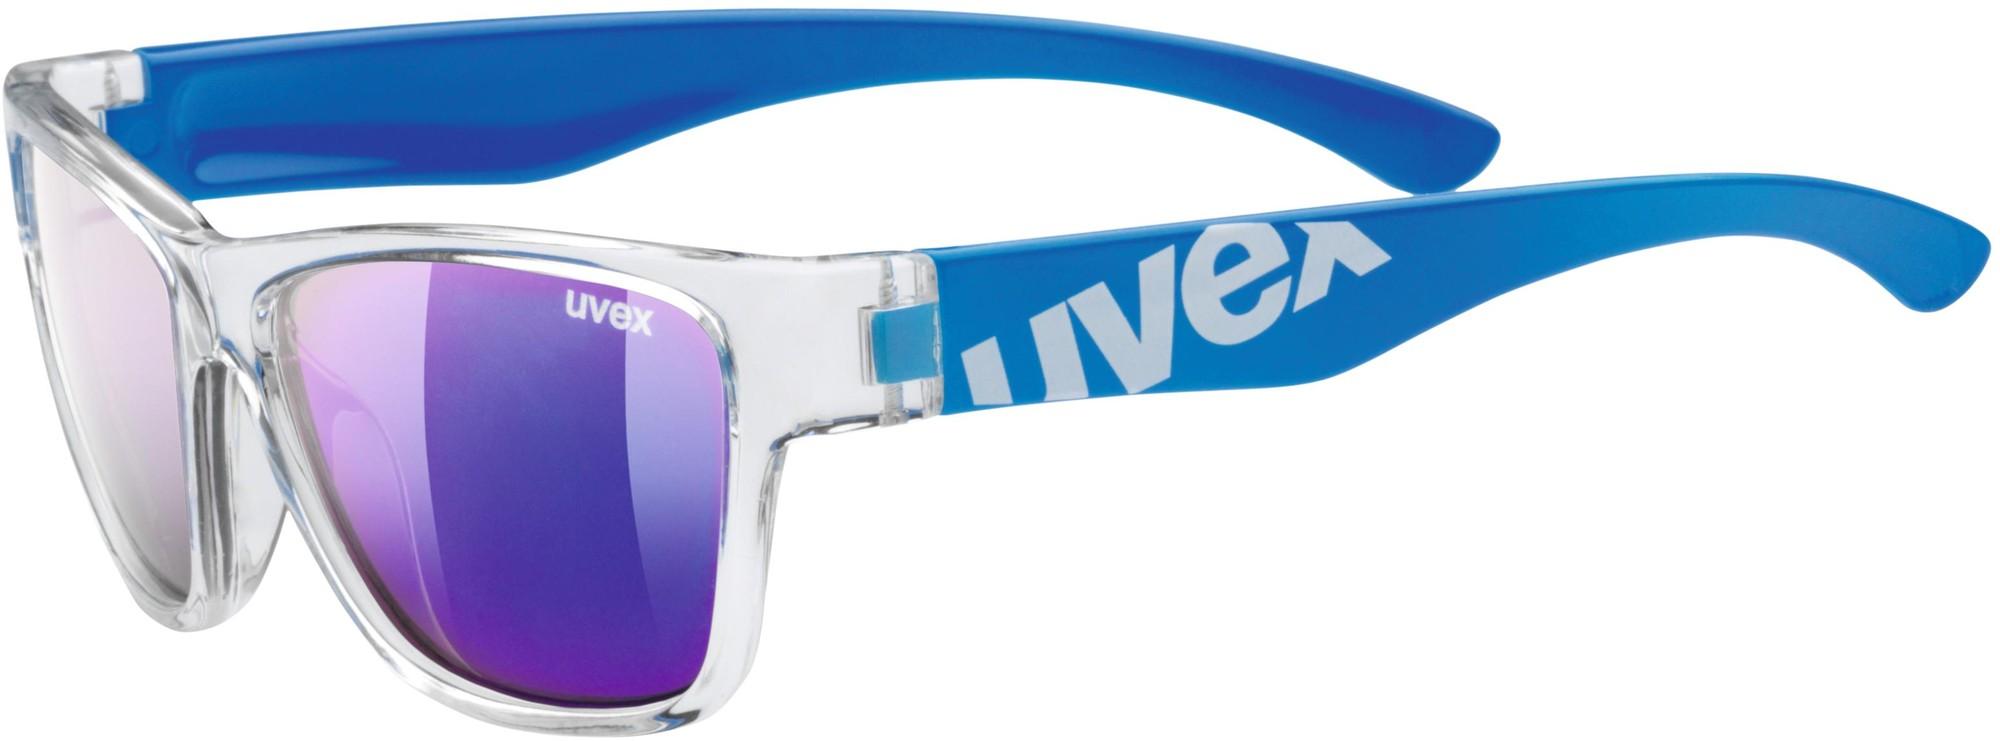 Uvex Солнцезащитные очки детские Uvex Sportstyle 508